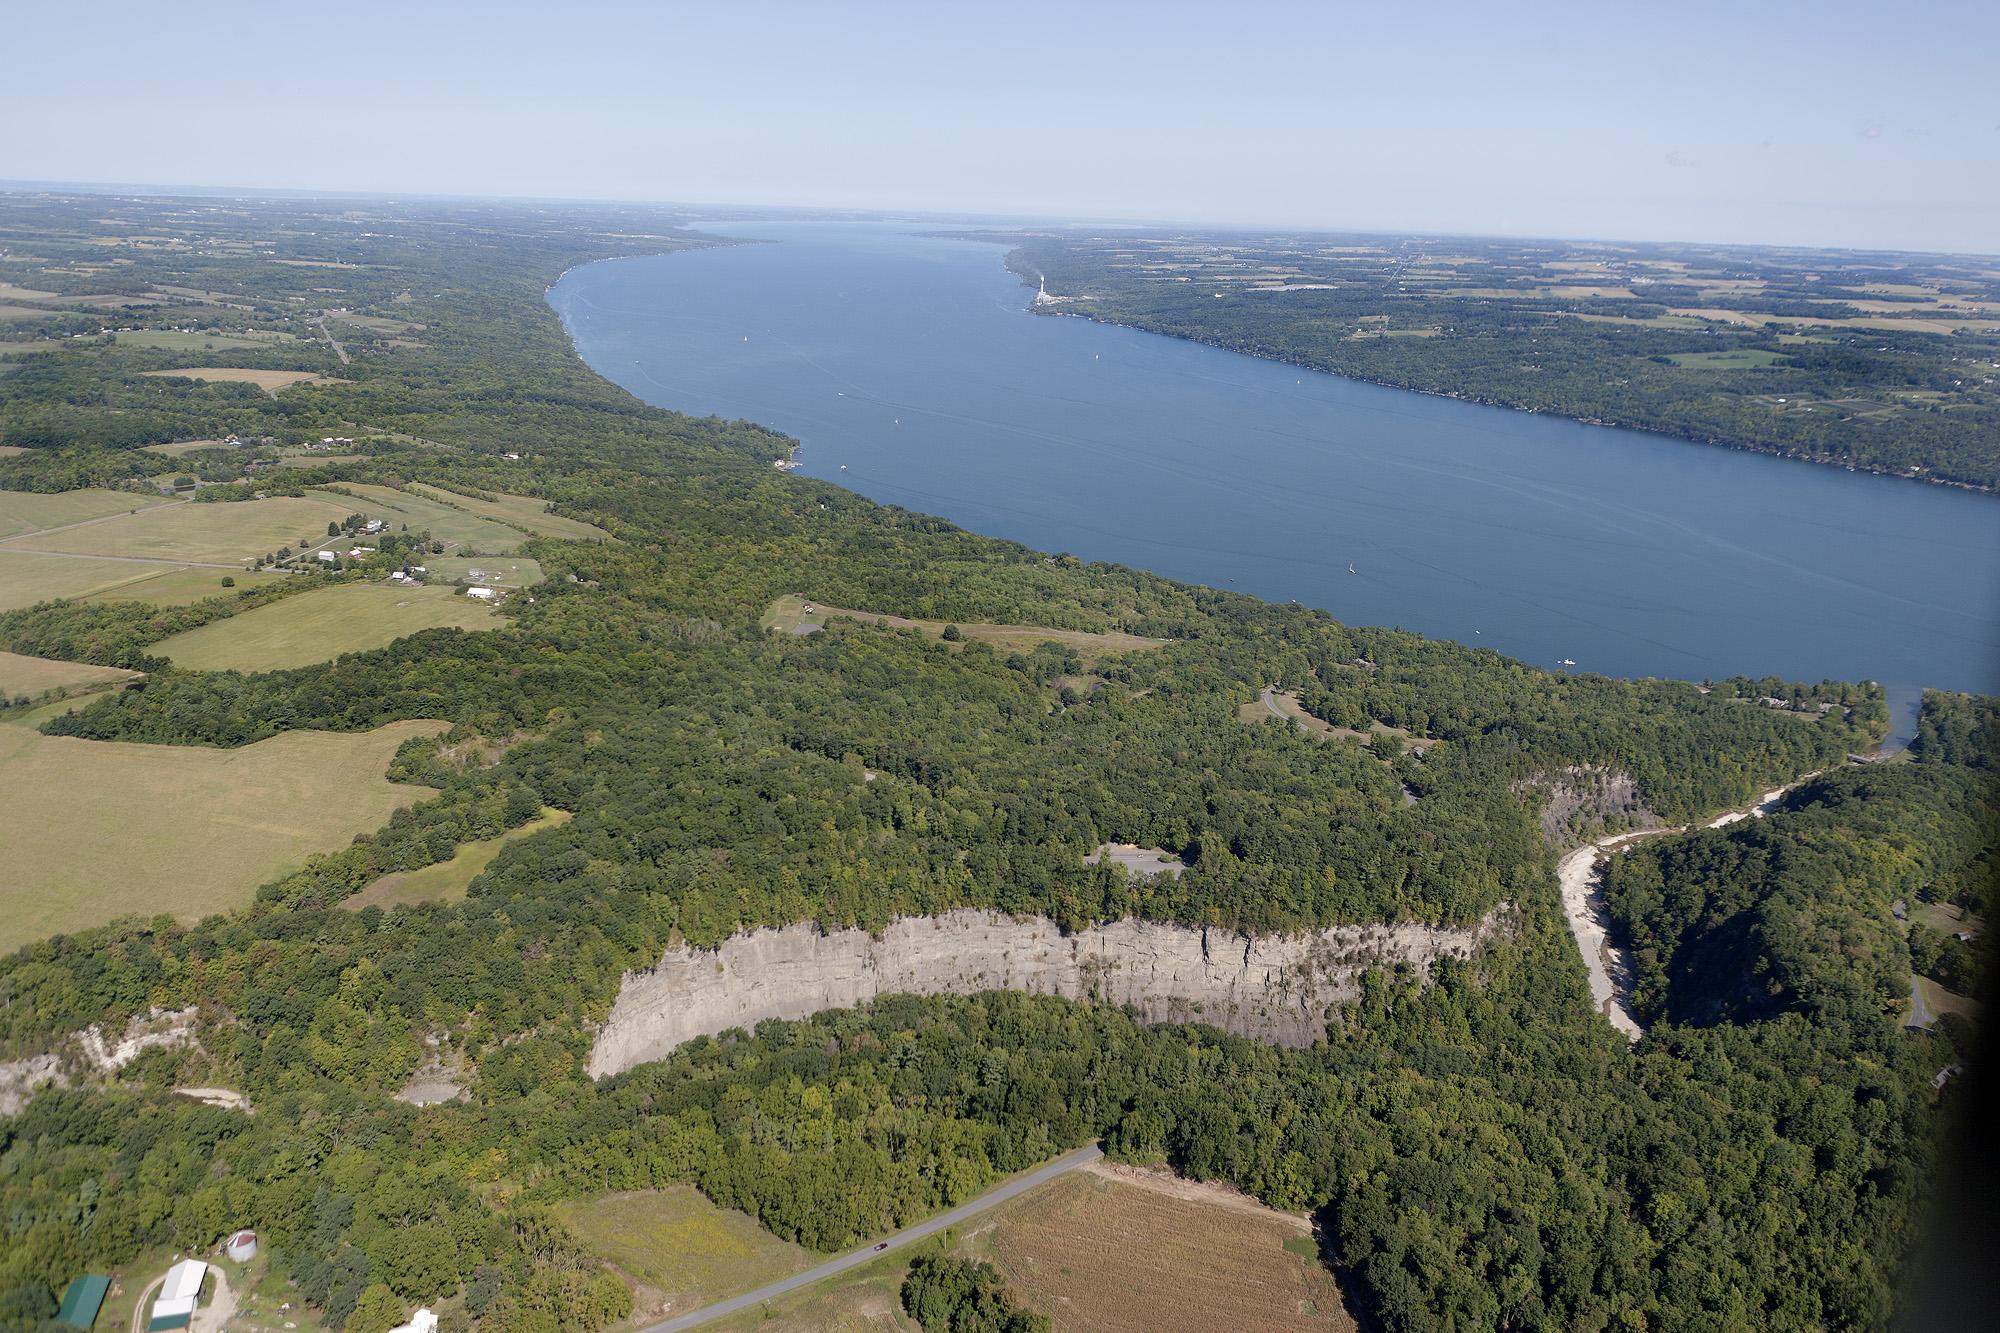 New york cayuga county - Taughannock Falls State Park Cayuga Lake Finger Lakes Tompkins County Seneca County